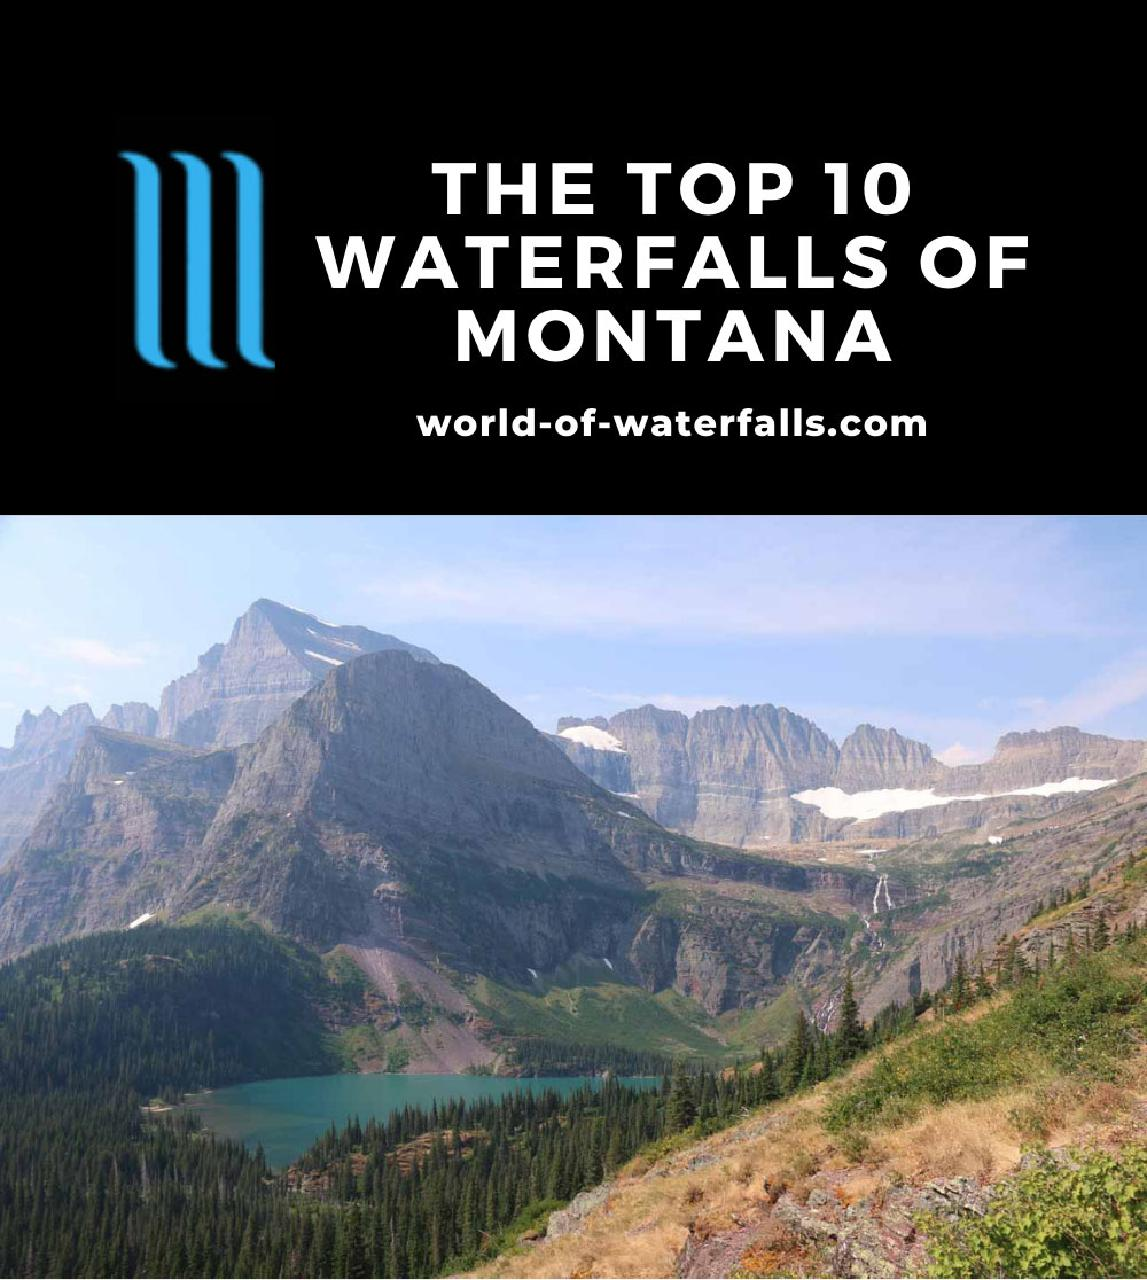 The Top 10 Waterfalls of Montana